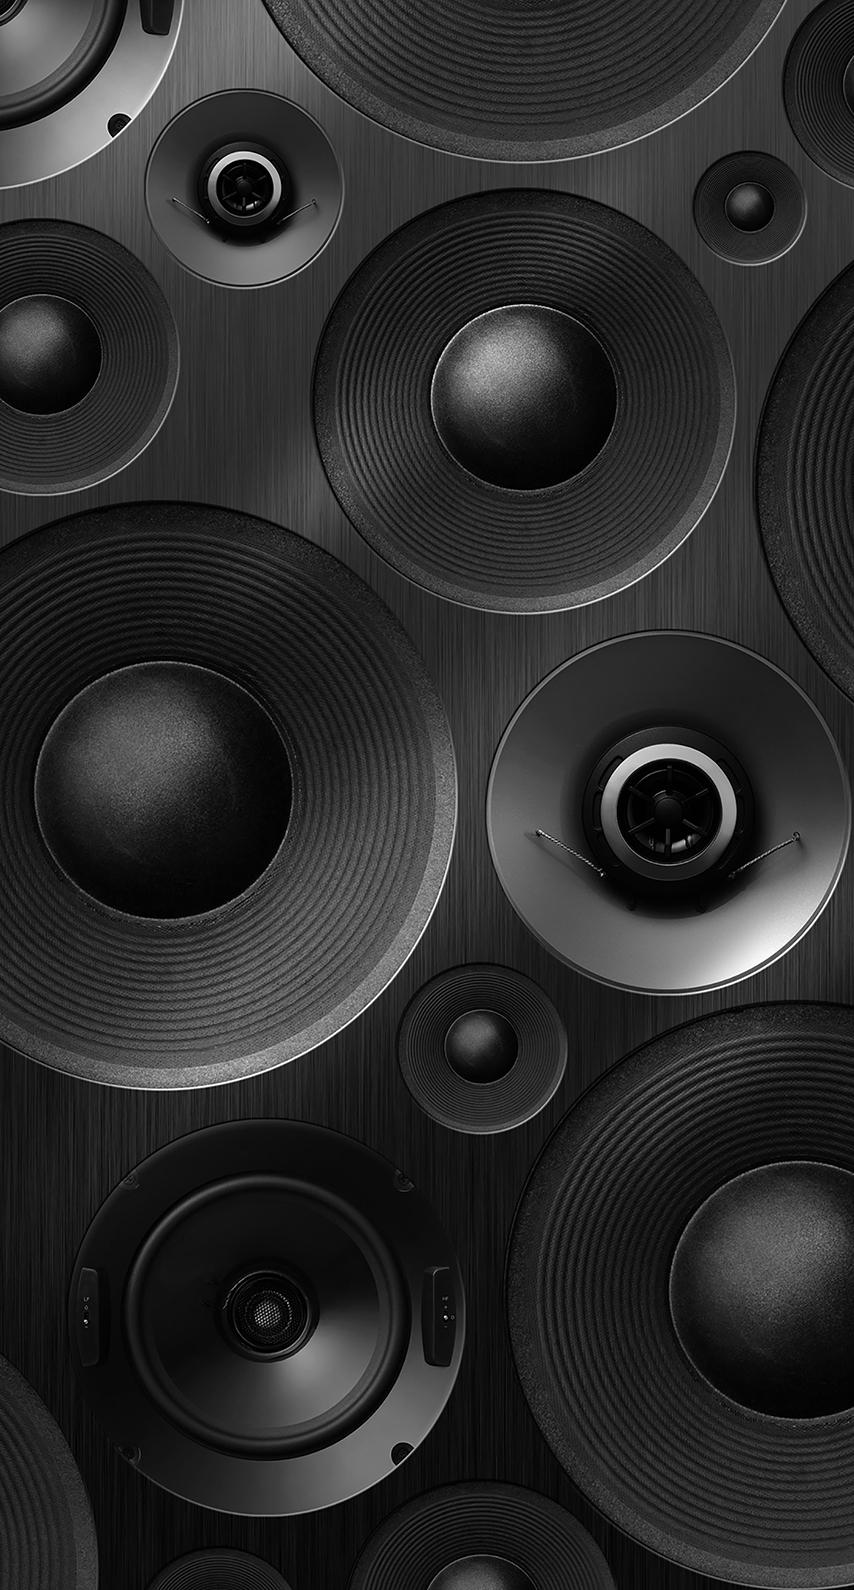 disco, plastic, intensity, audio, amplifier